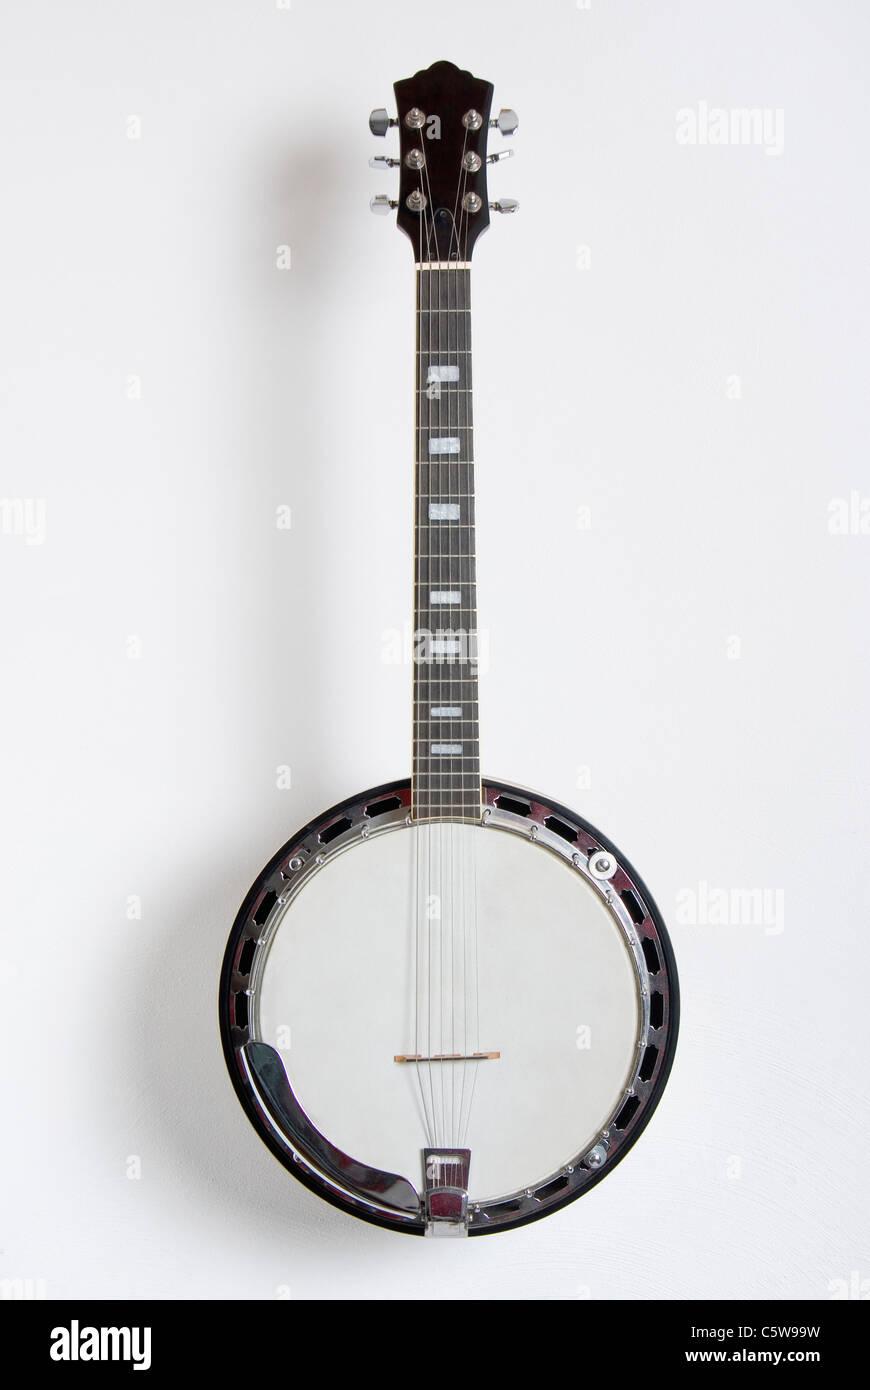 Banjo - Stock Image